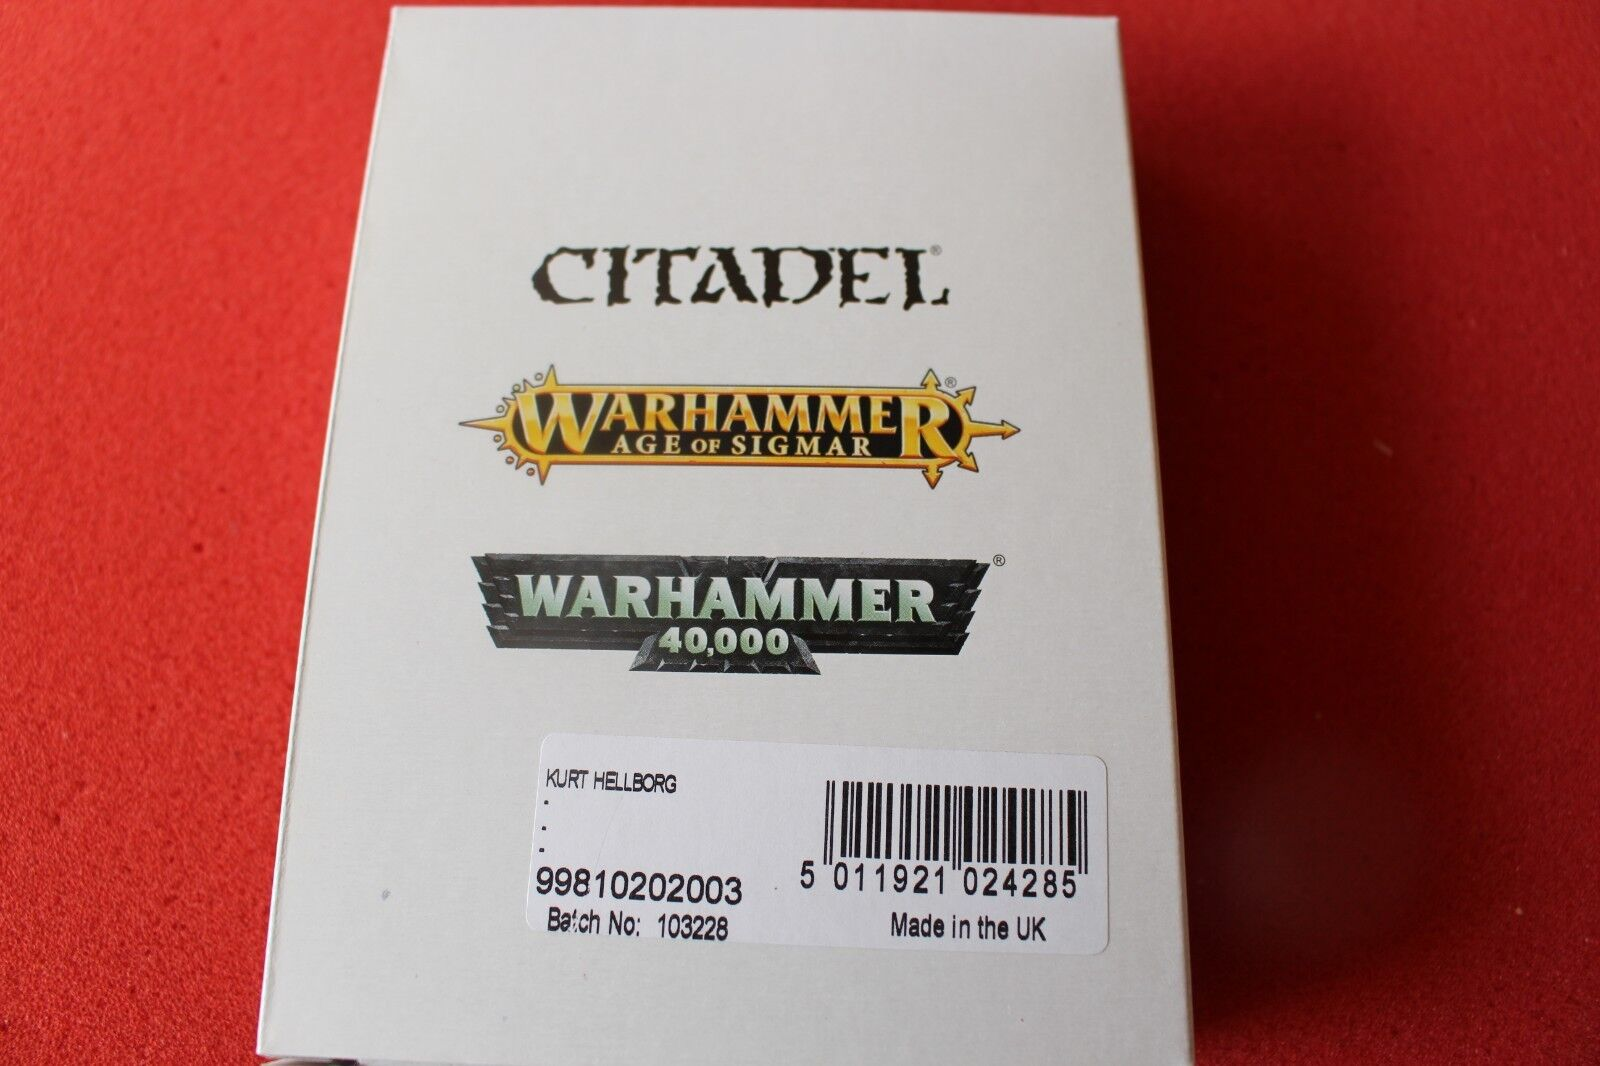 Games Games Games Workshop Warhammer L'empire Kurt HELBORG Entièrement neuf dans sa boîte Finecast Neuf Épuisé HELLBORG 4f0267